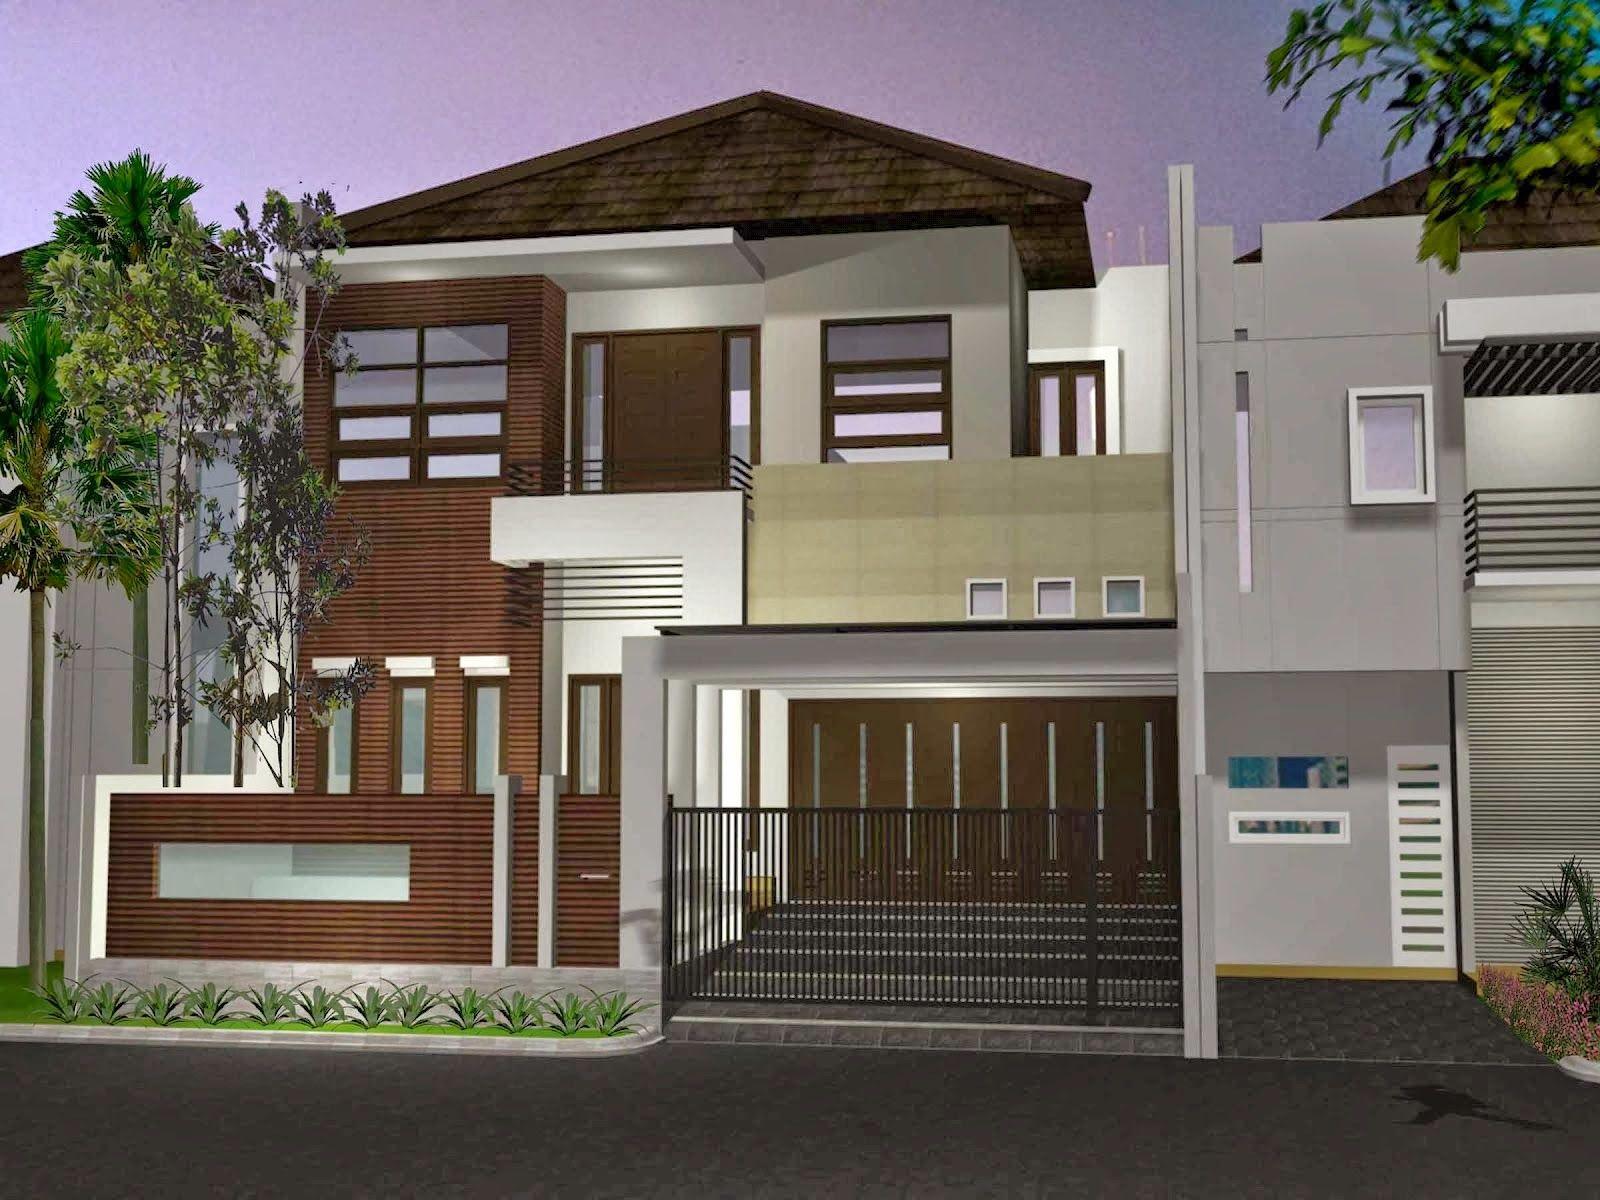 Minimalist House Design Level Two Desain Rumah Minimalis Dua